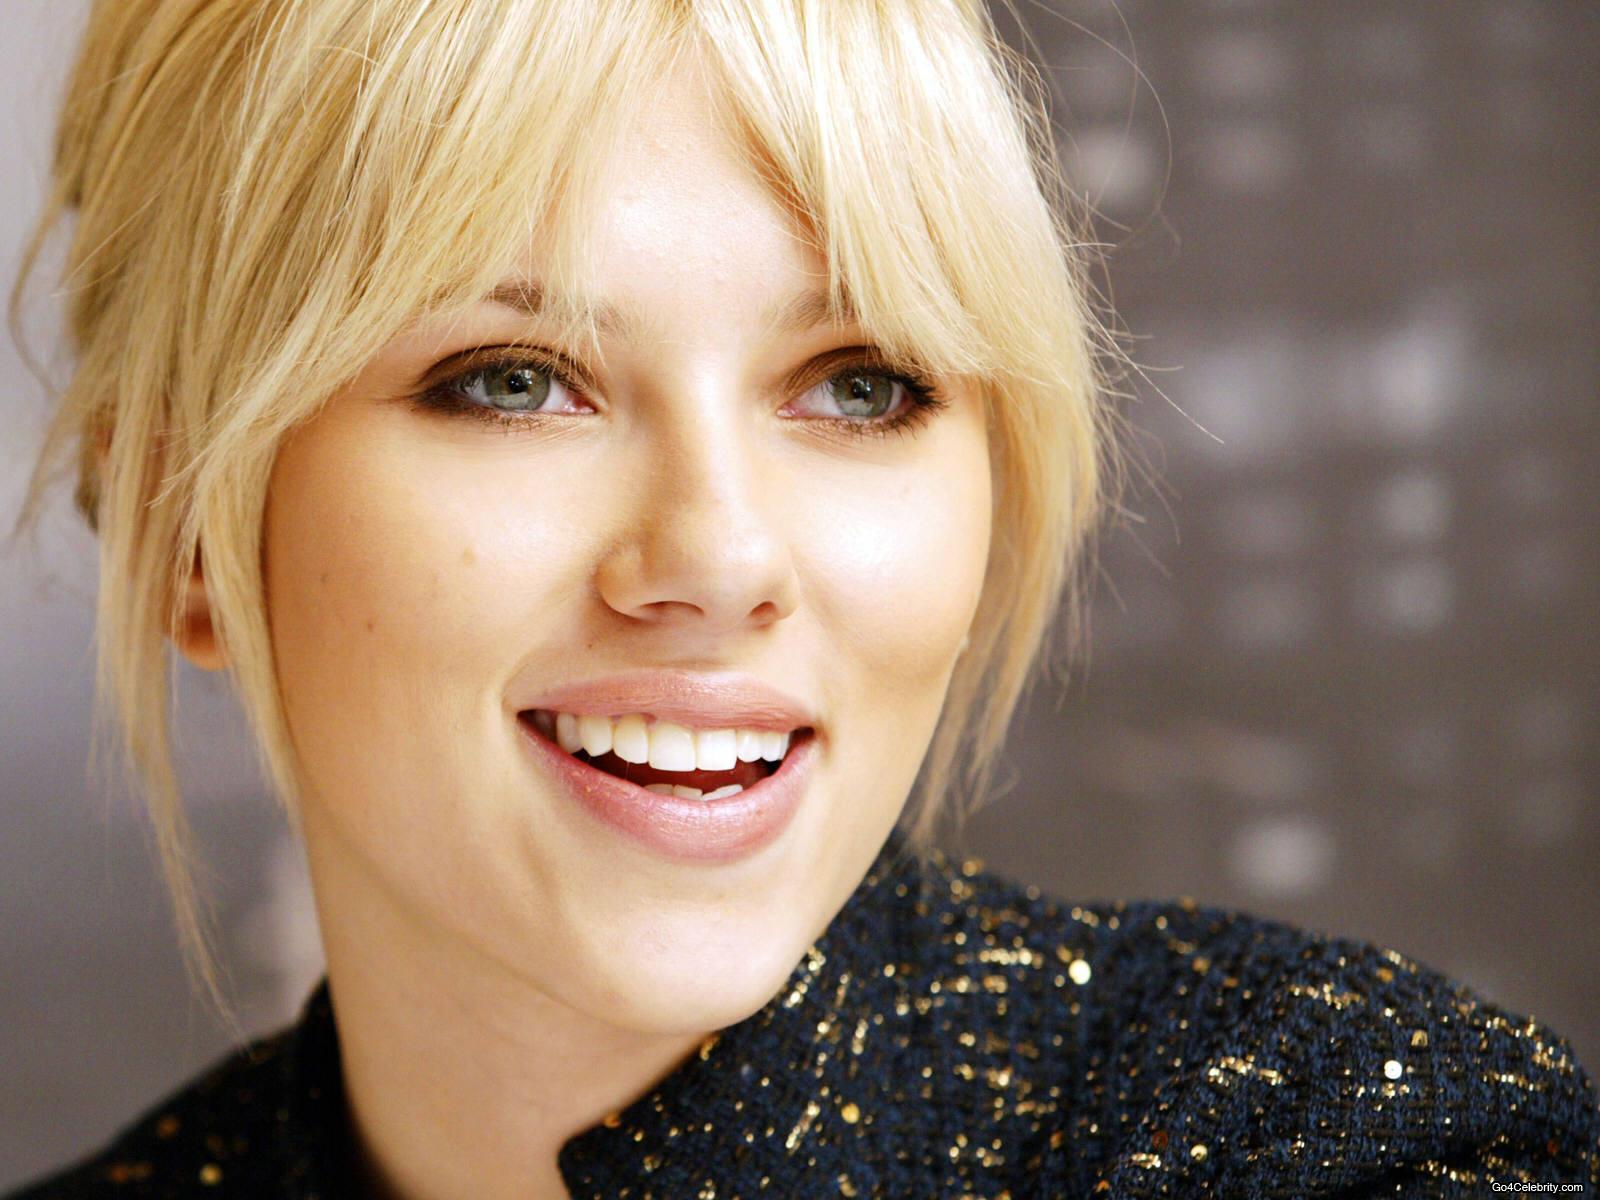 http://4.bp.blogspot.com/-RMEoFegis7c/TyrQjLDHfrI/AAAAAAAAND4/y8g4GHFptrI/s1600/Scarlett-Johansson-028.jpg